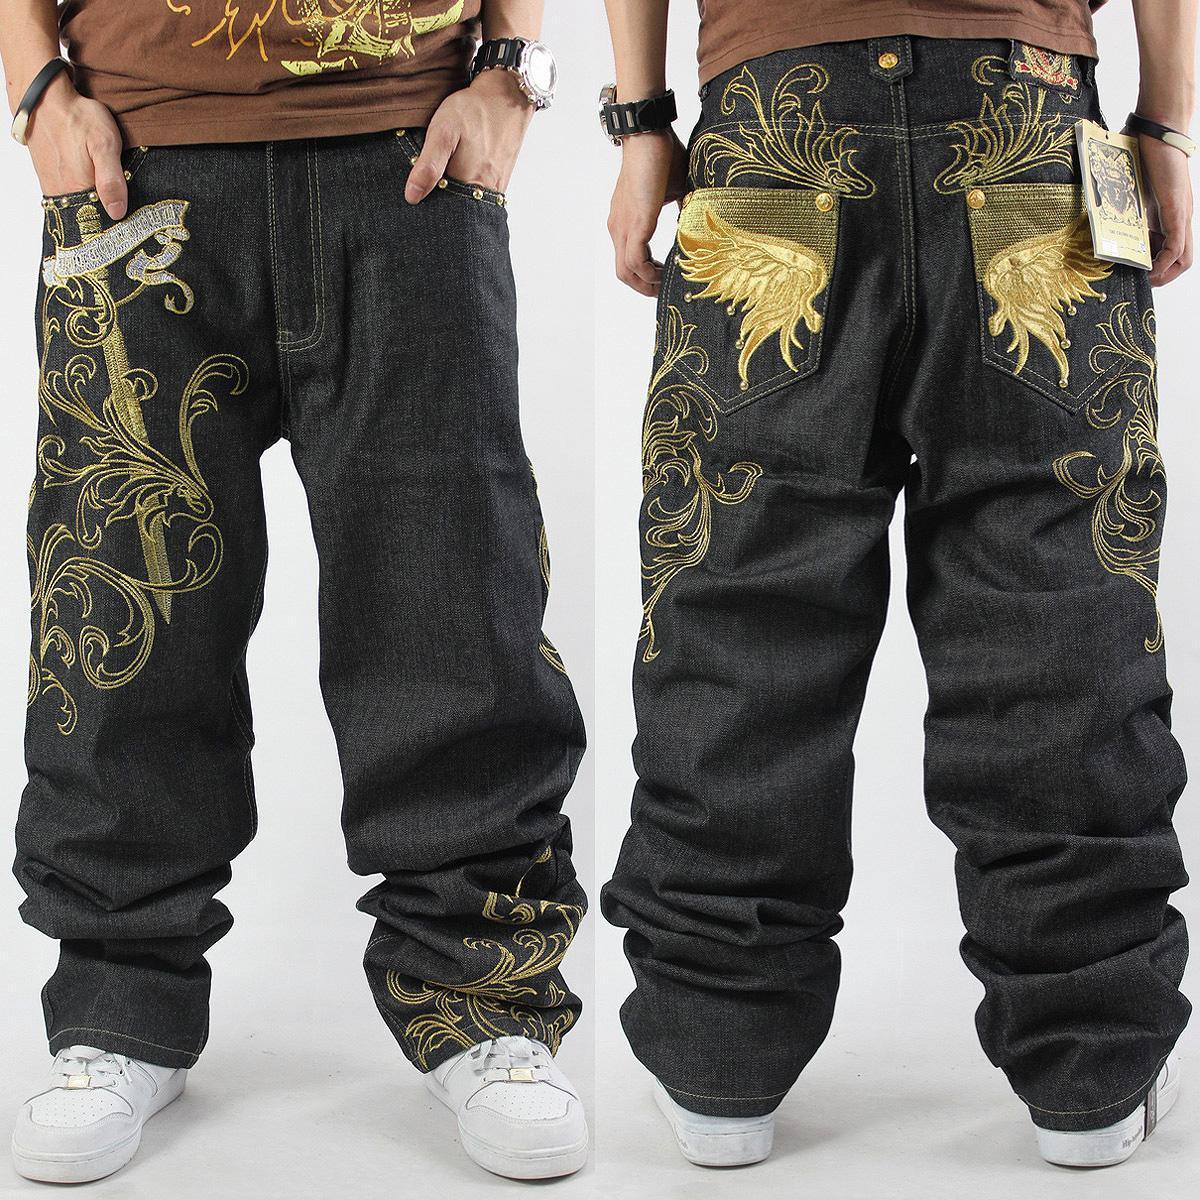 2017 Men Hip Hop Jeans Skateboard Men Baggy Jeans Mens Denim Hit Hop Pants Casual Loose Jeans Rap Street WearОдежда и ак�е��уары<br><br><br>Aliexpress